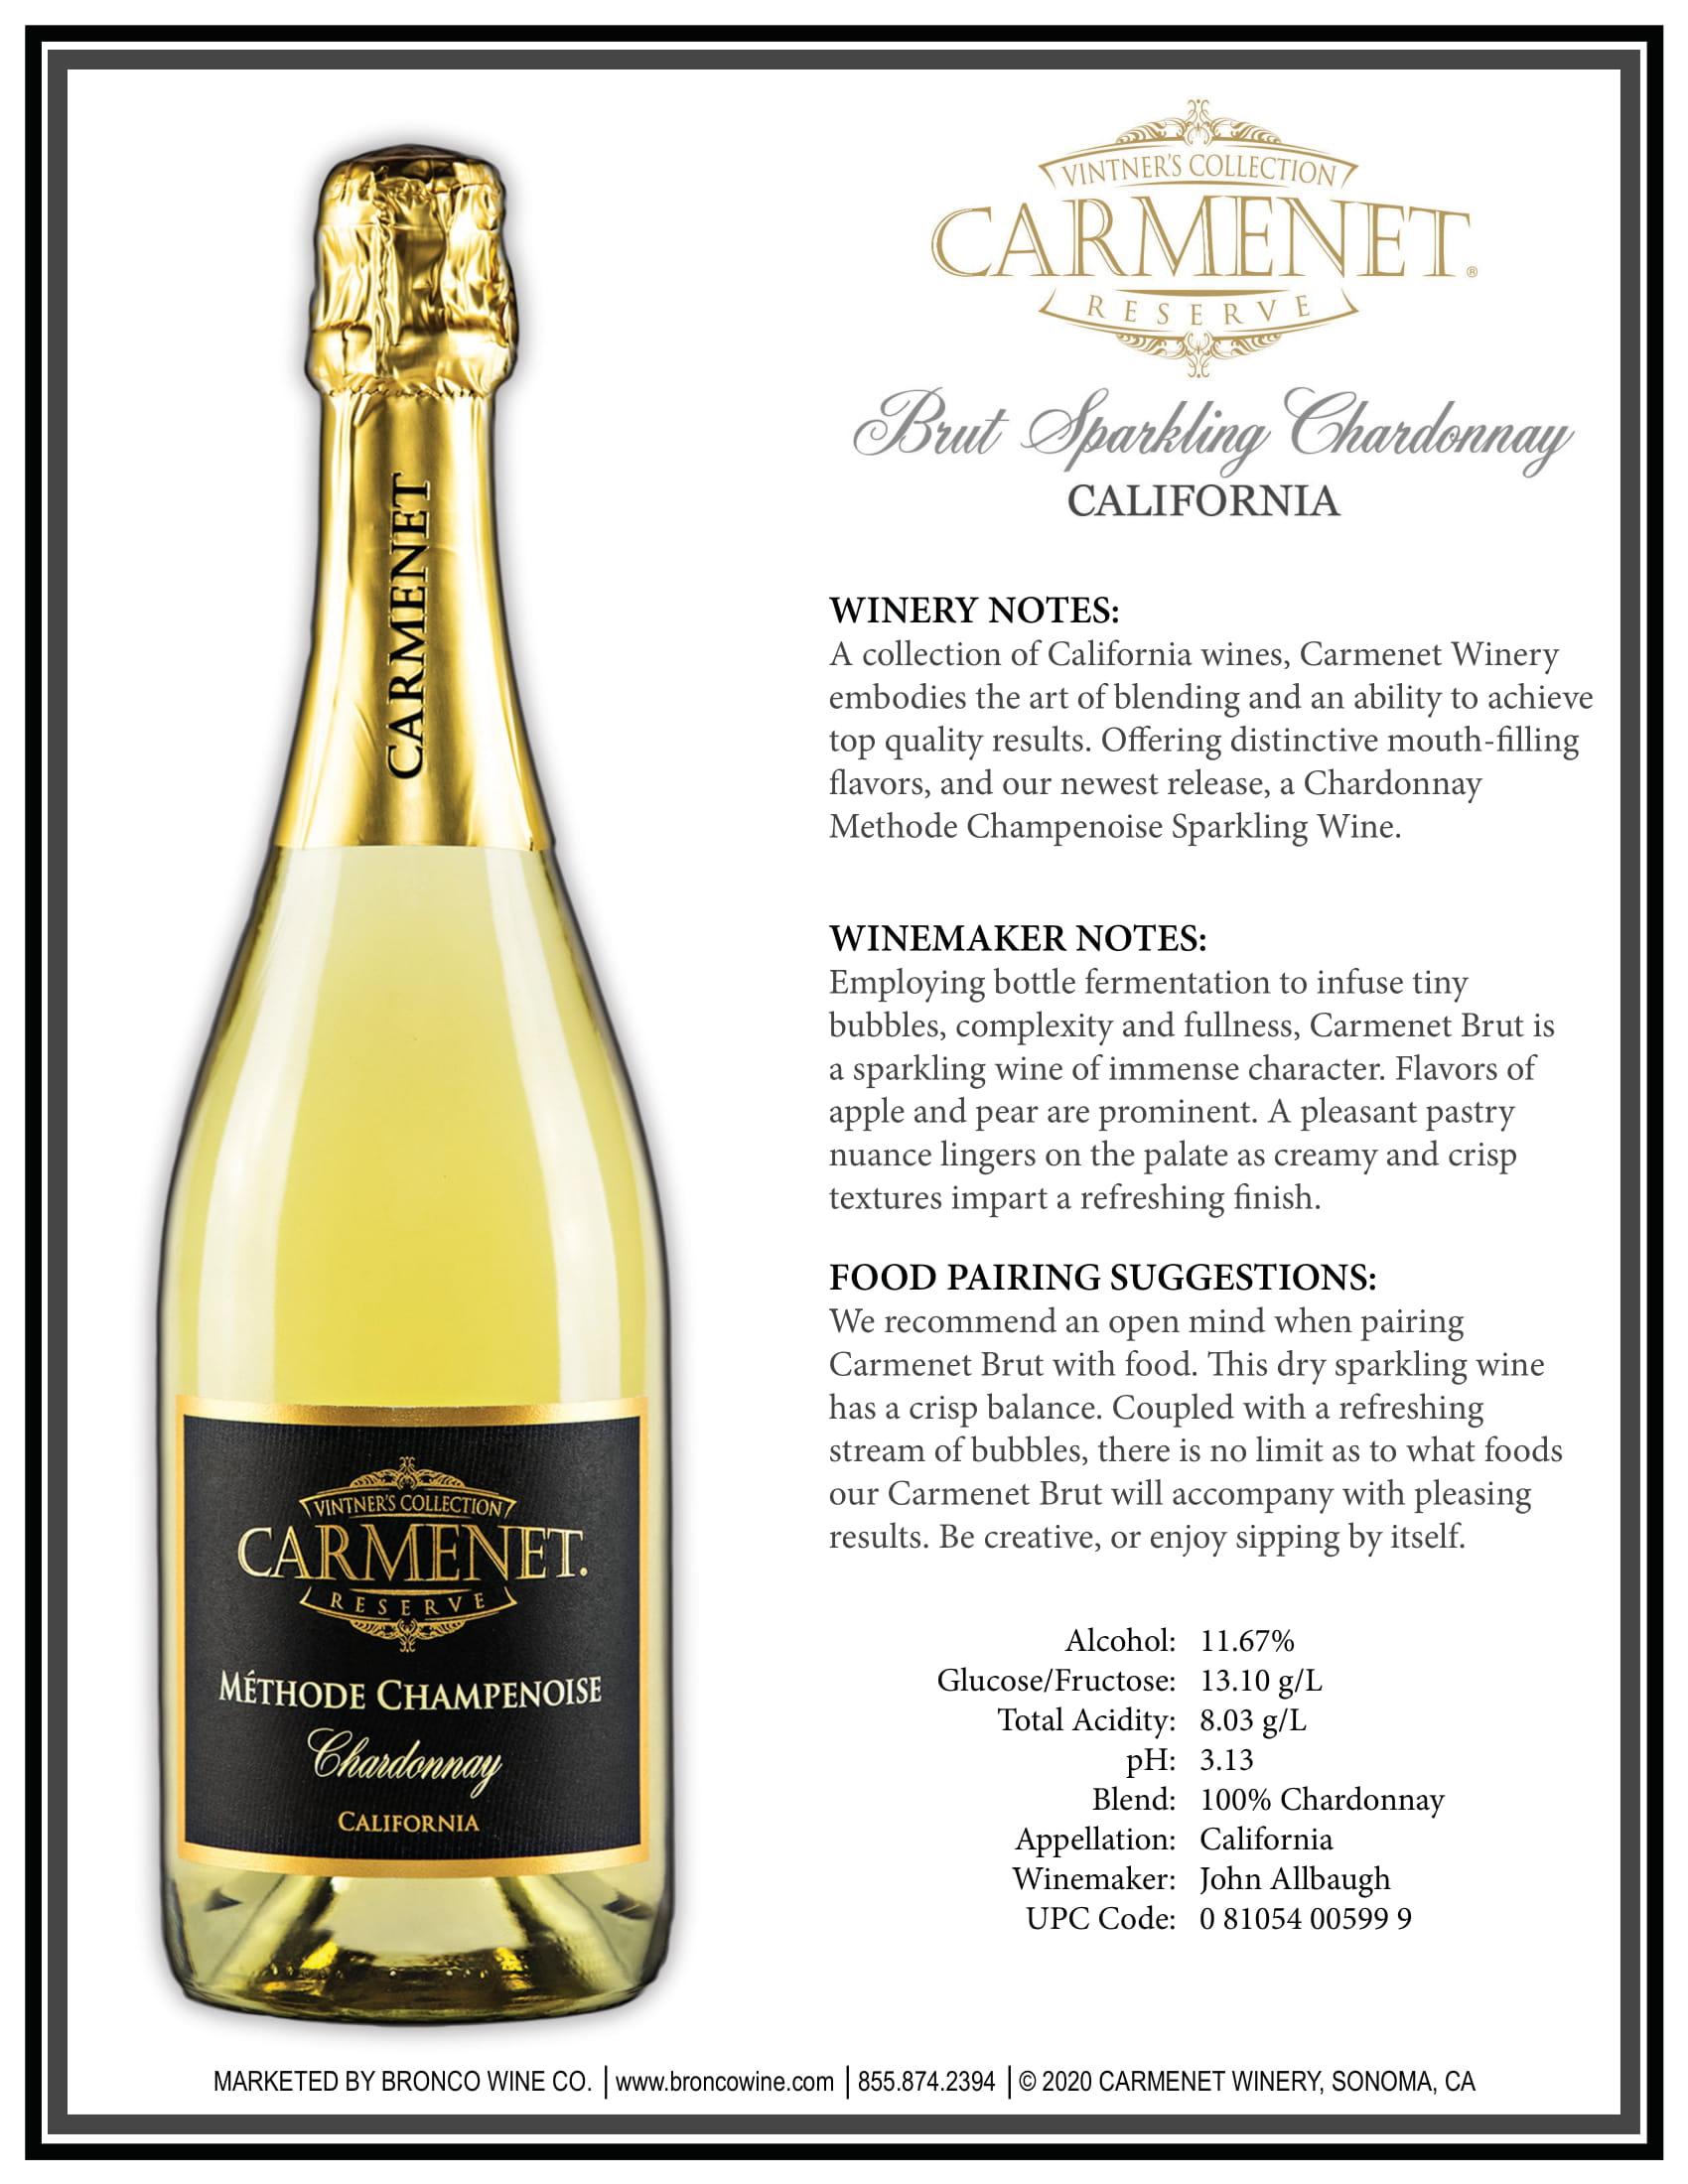 Carmenet Sparkling Chardonnay Sell Sheet